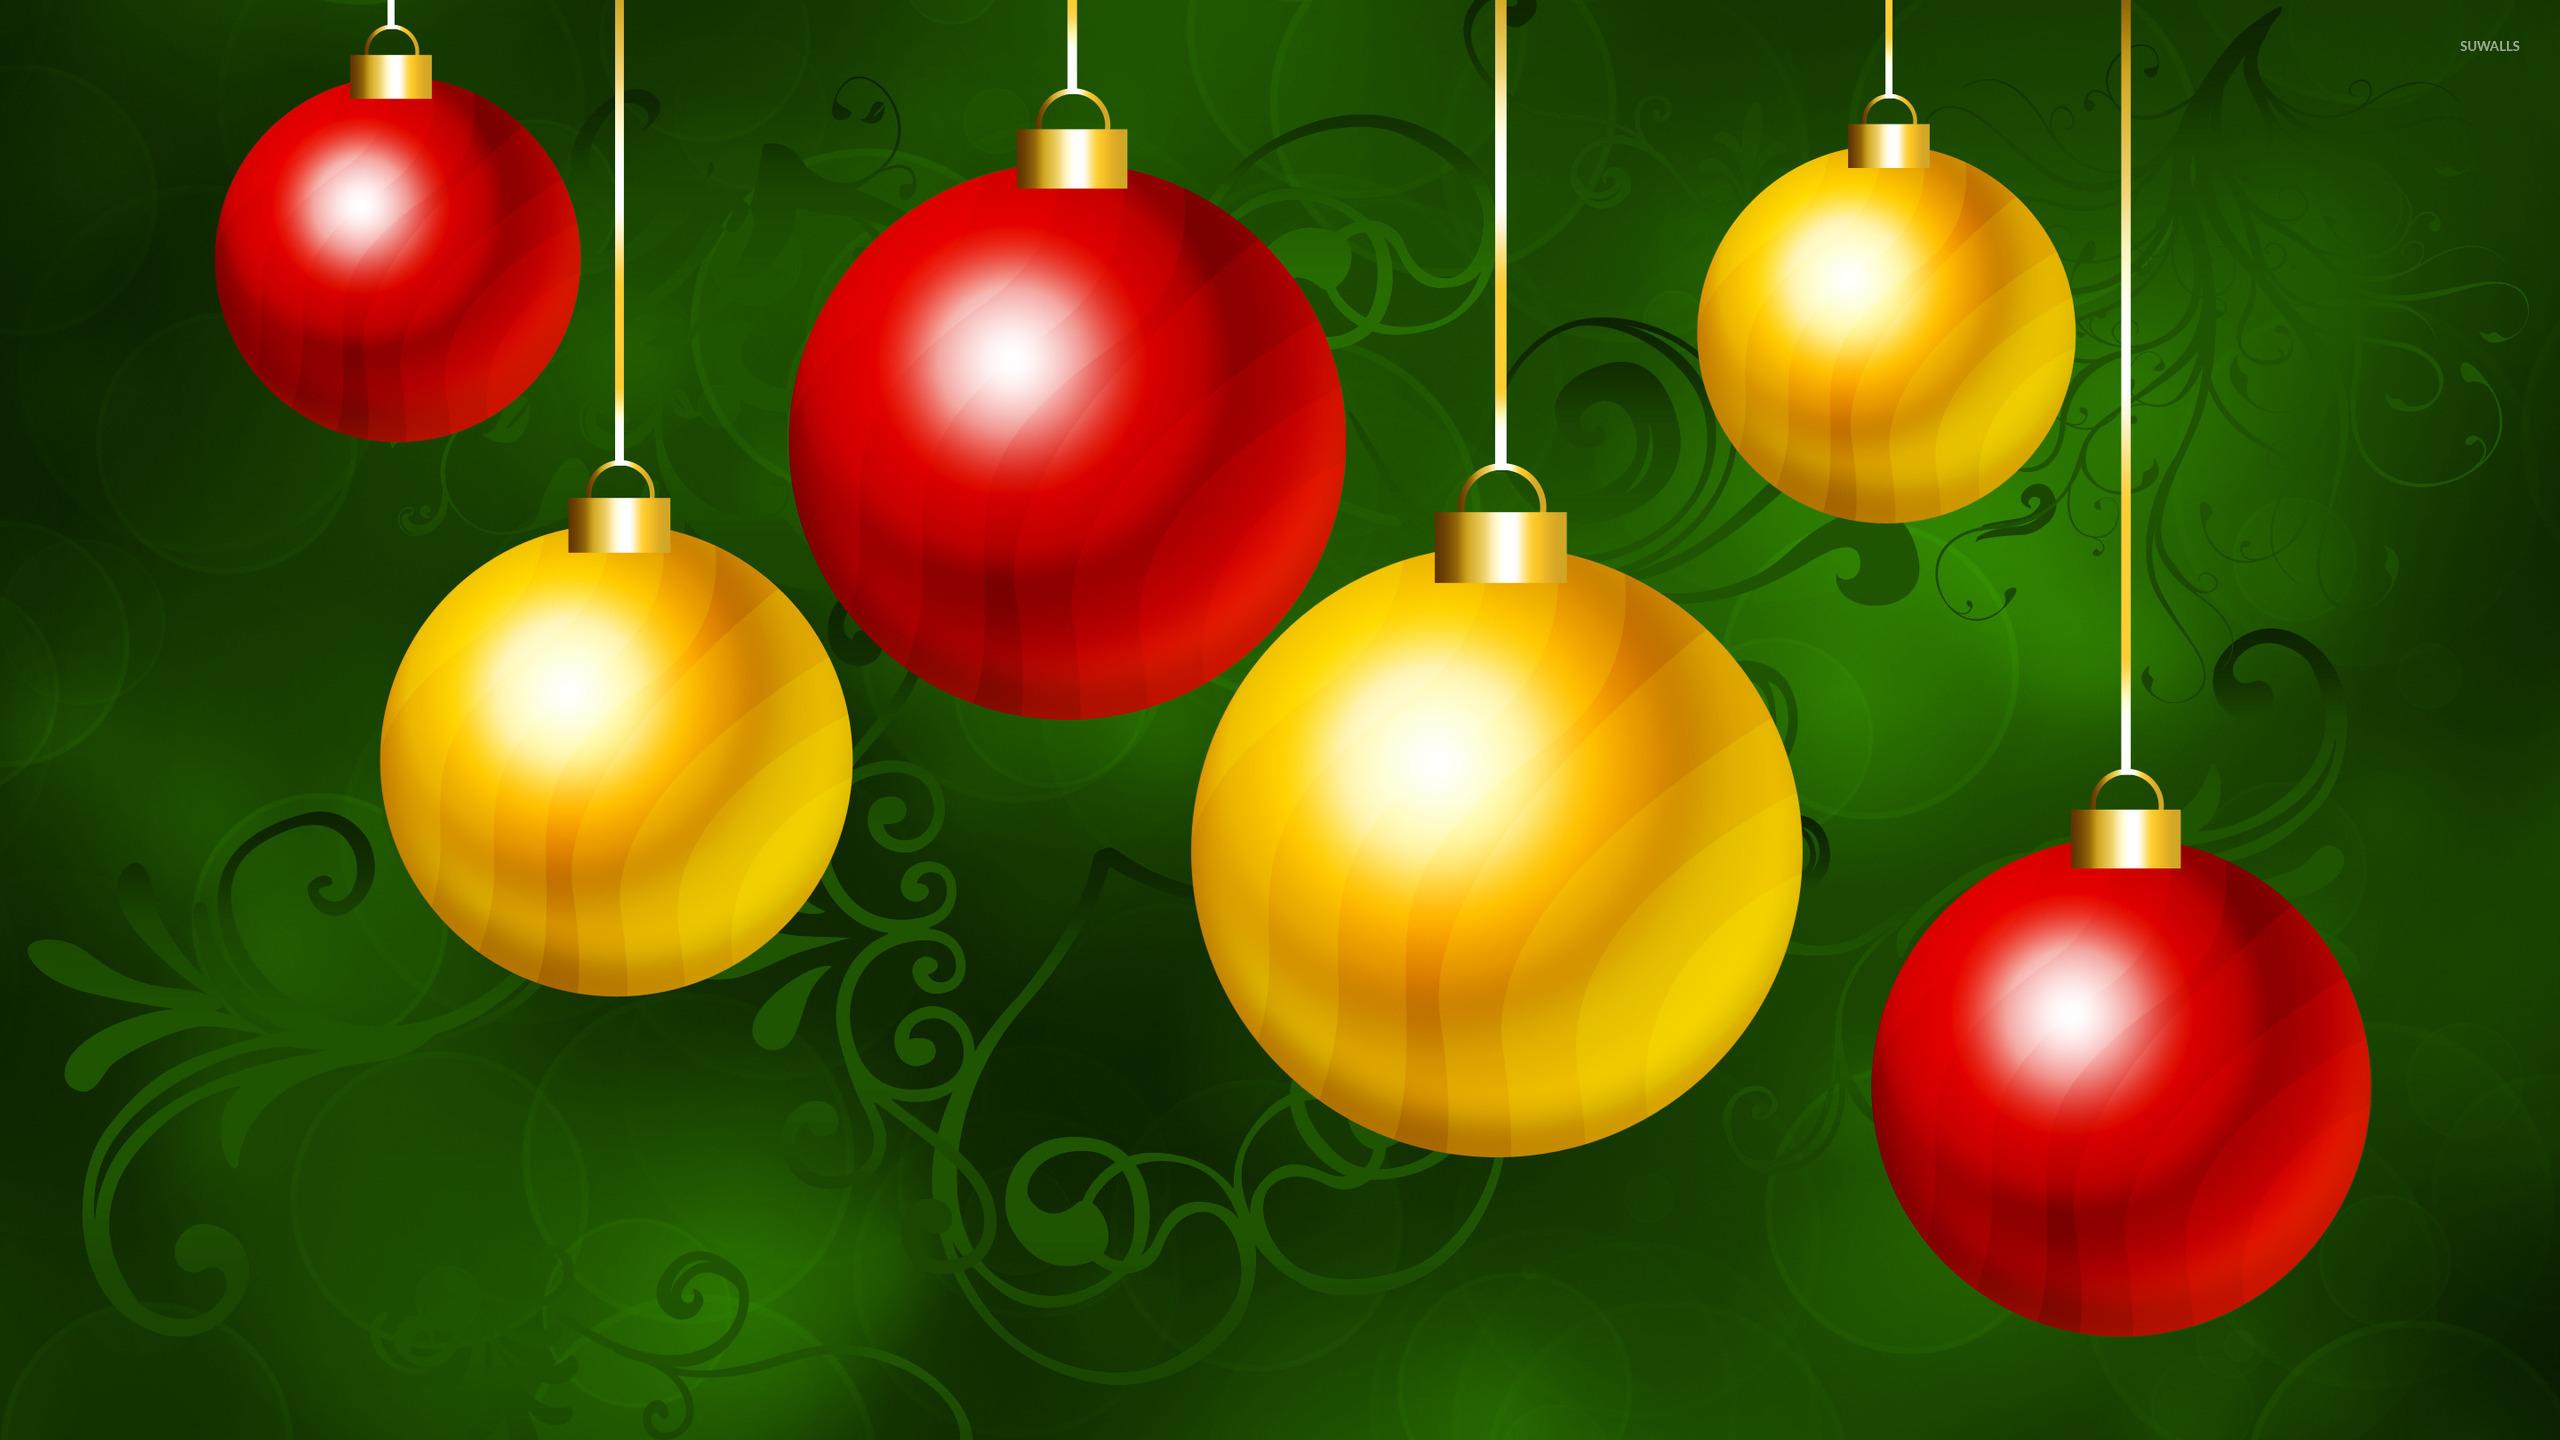 Christmas ornaments wallpaper holiday wallpapers